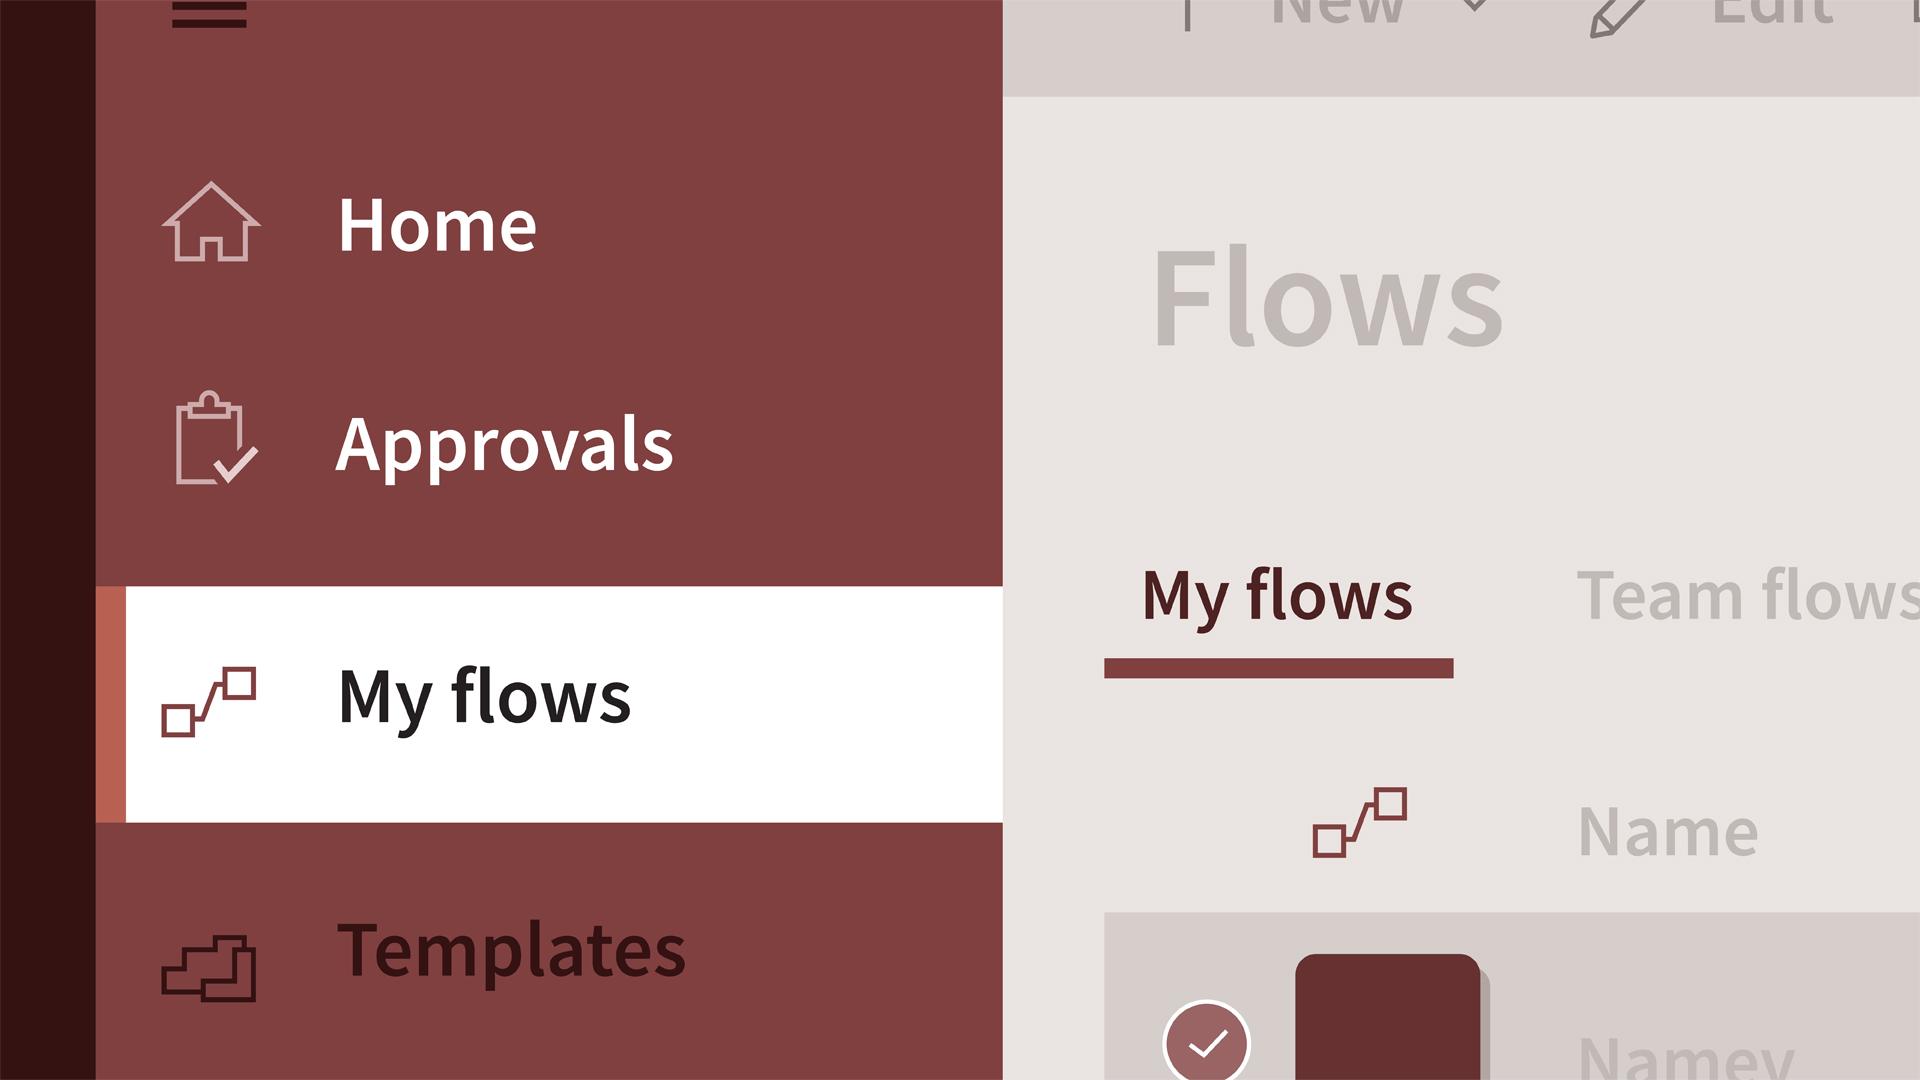 Microsoft Flow: Approval Flows